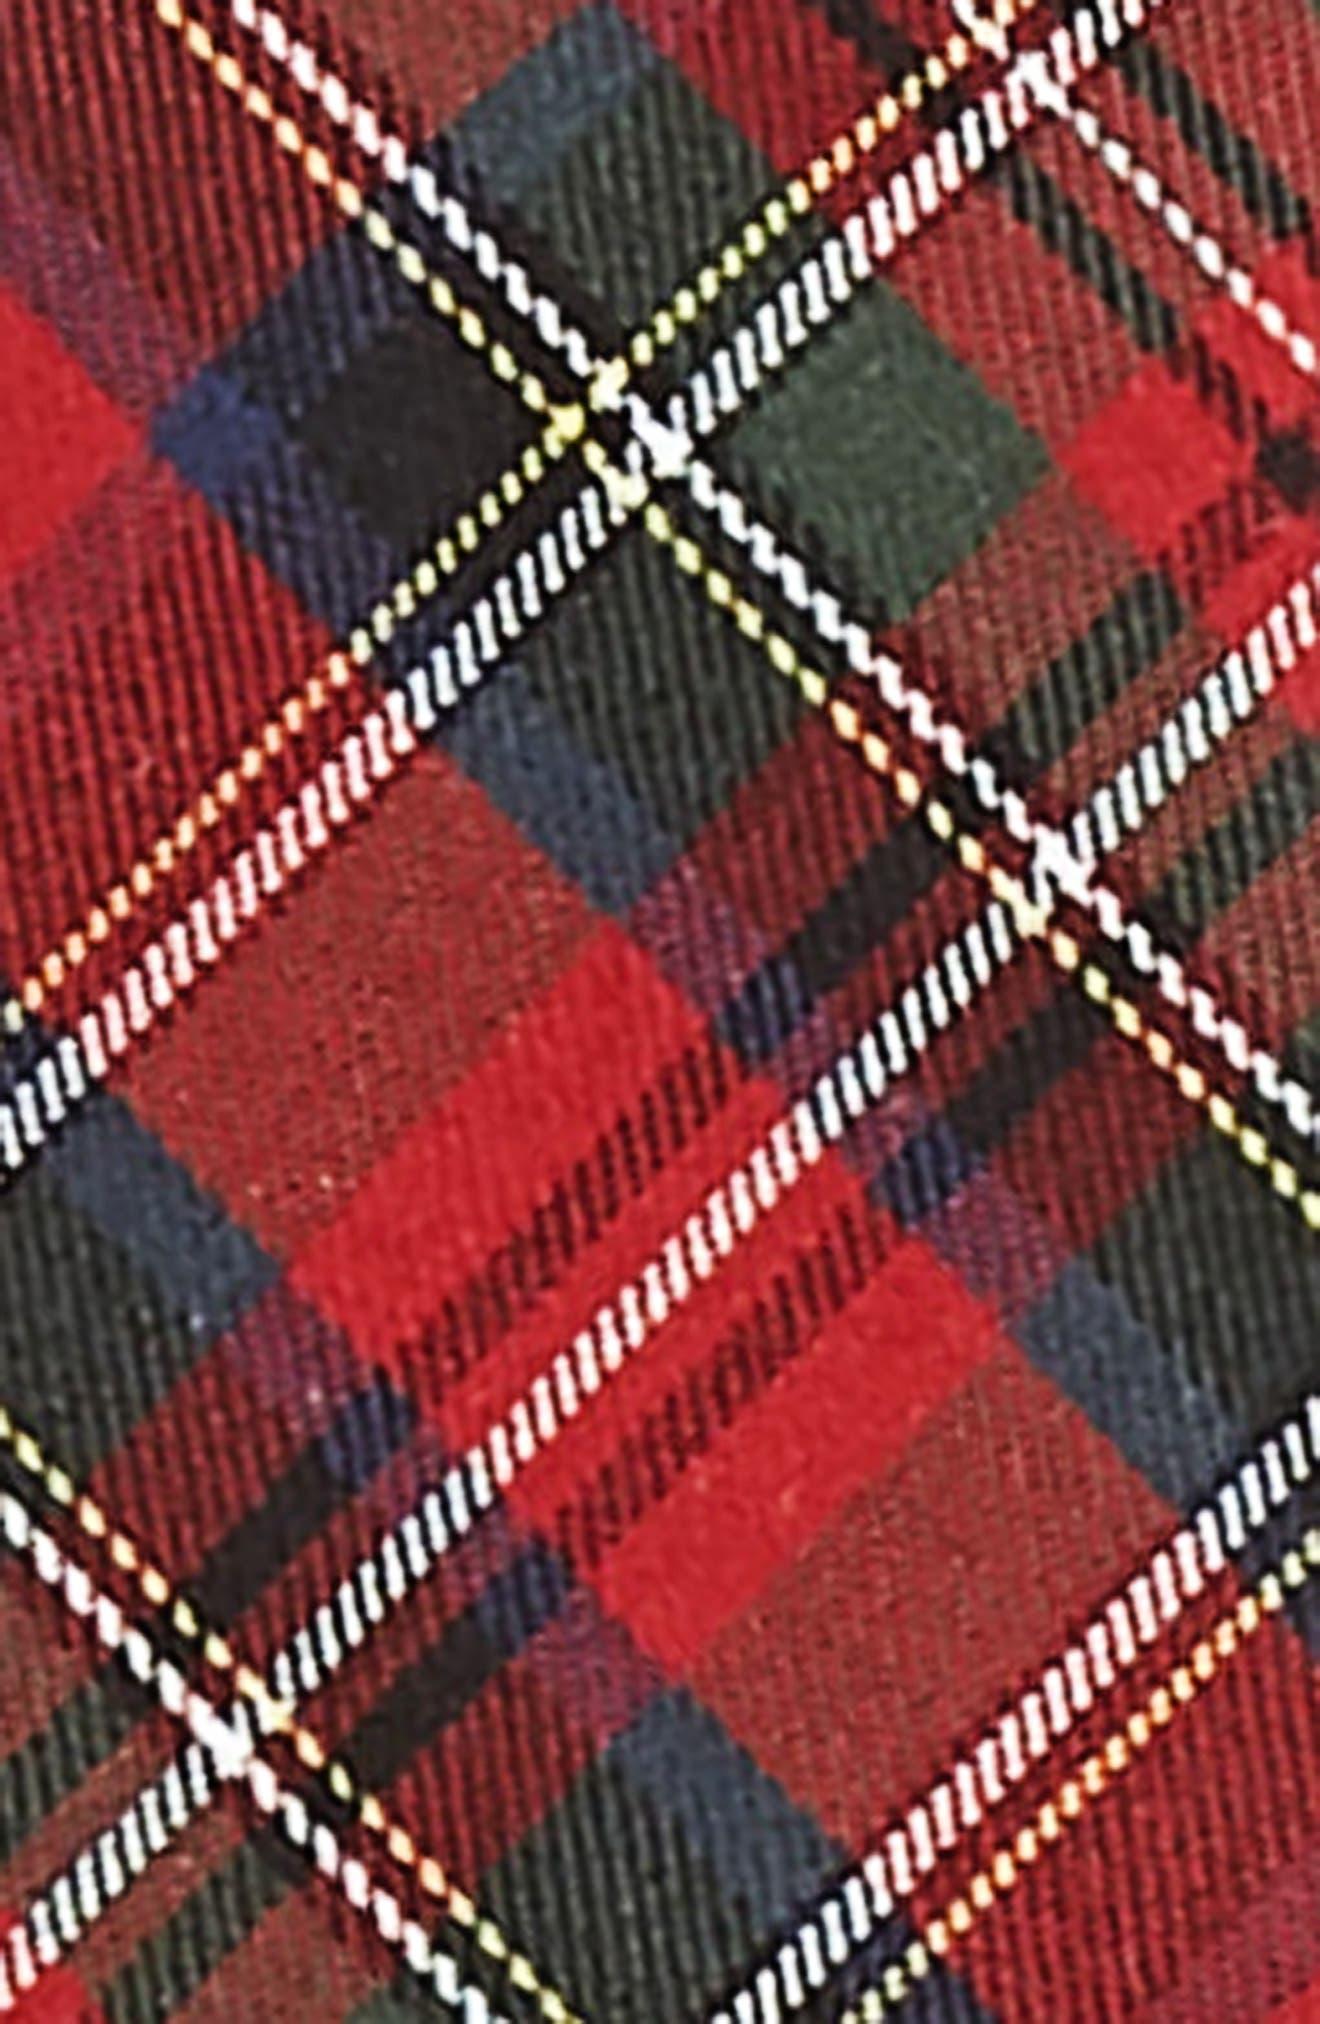 Nordstrom Men's Short Tartan Plaid Suspenders,                             Alternate thumbnail 2, color,                             RED/ BLACK